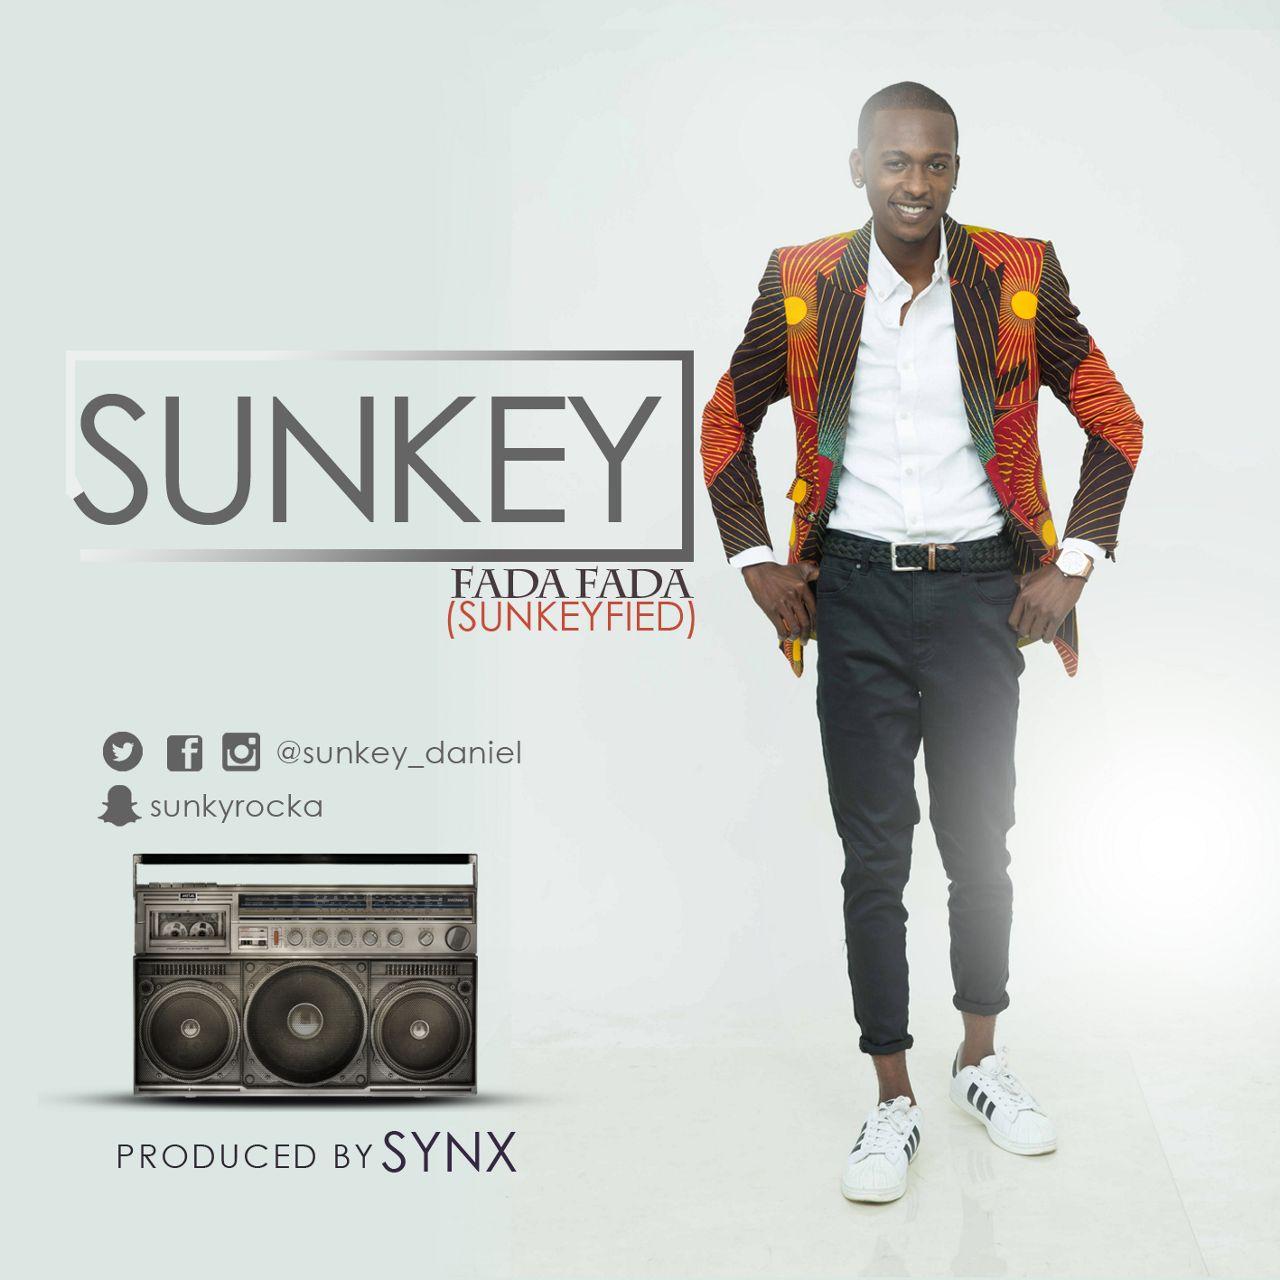 Sunkey – Fada Fada (Sunkeyfied) | Phyno Cover